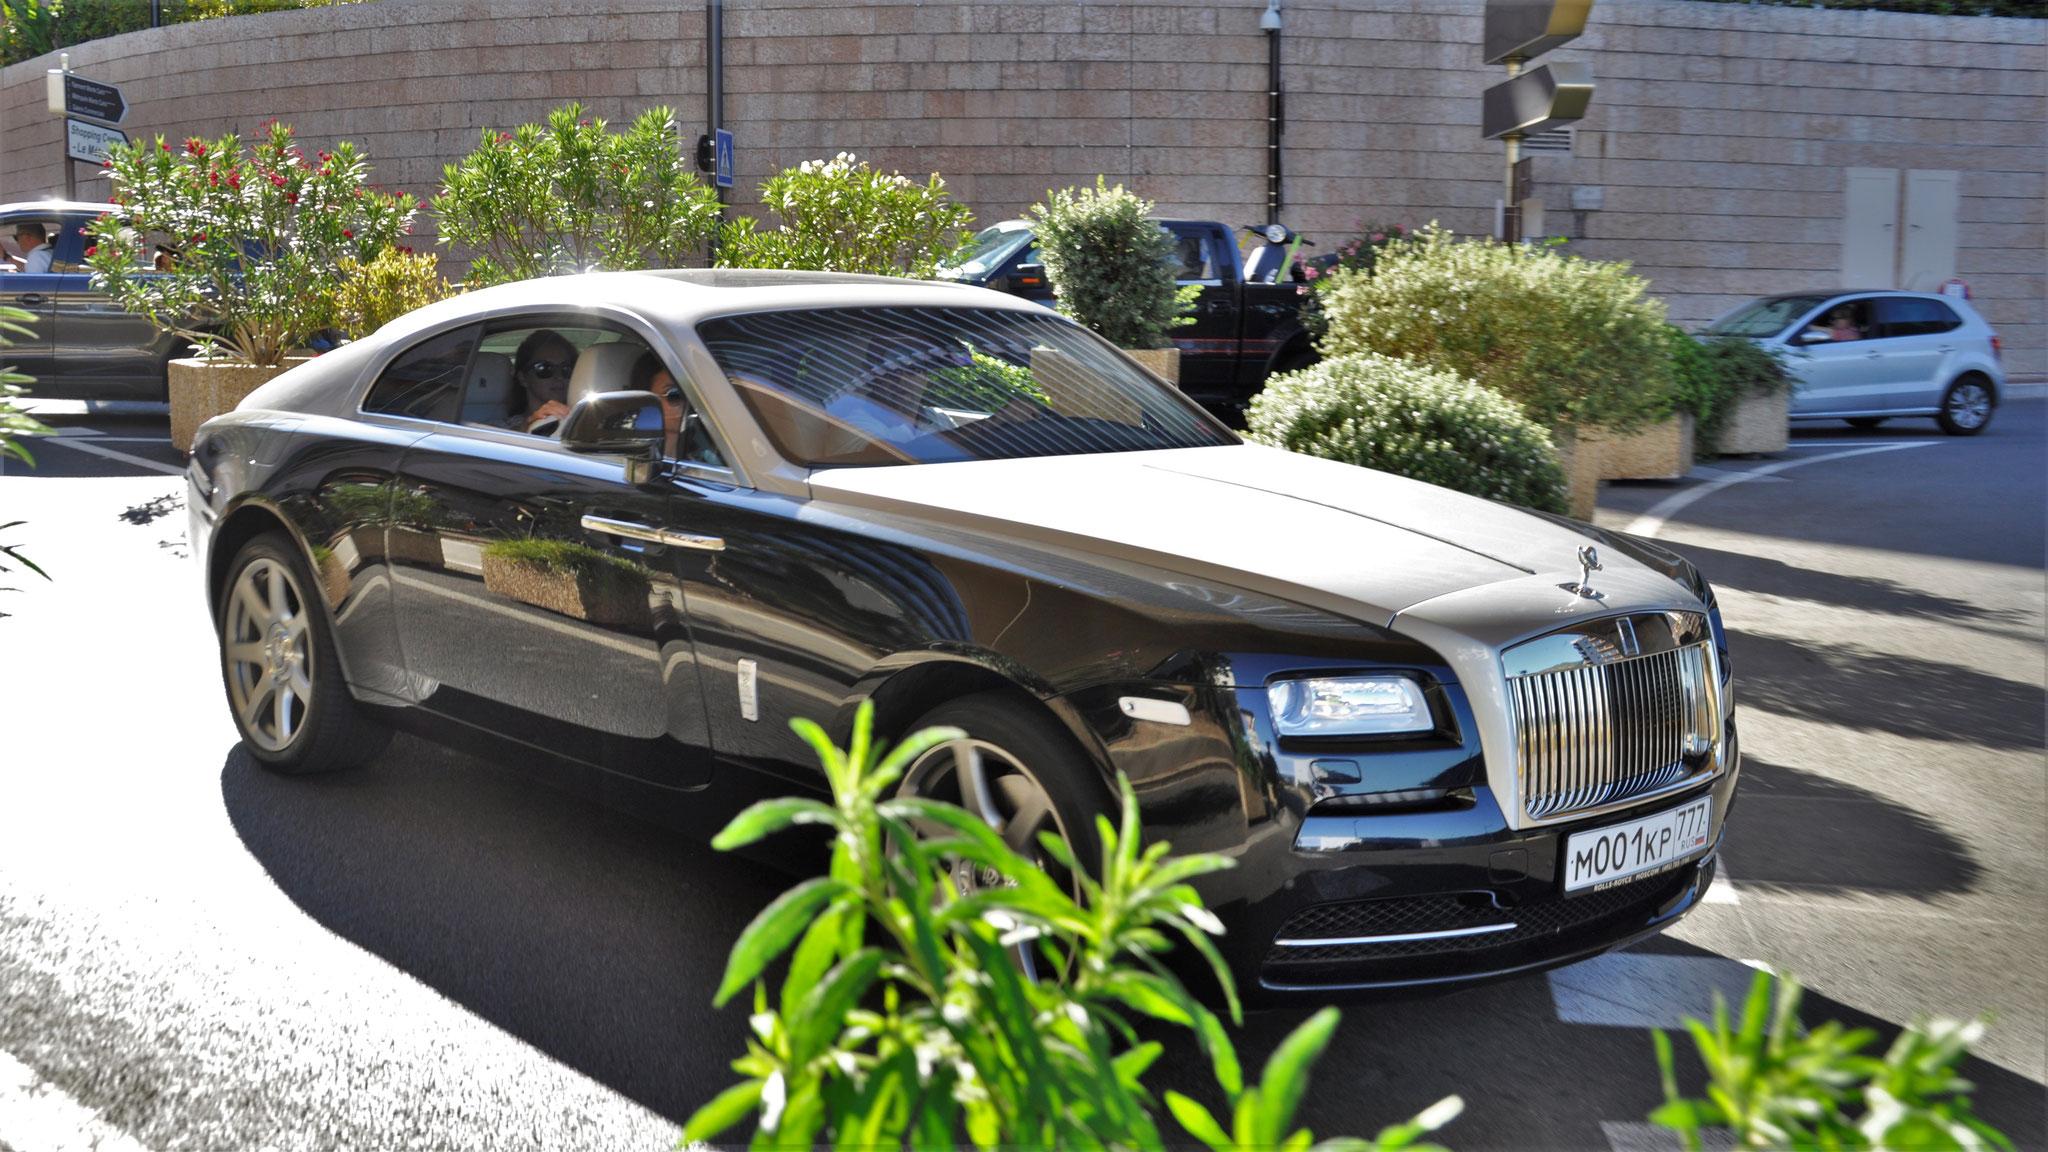 Rolls Royce Wraith - M-001-KP-777 (RUS)